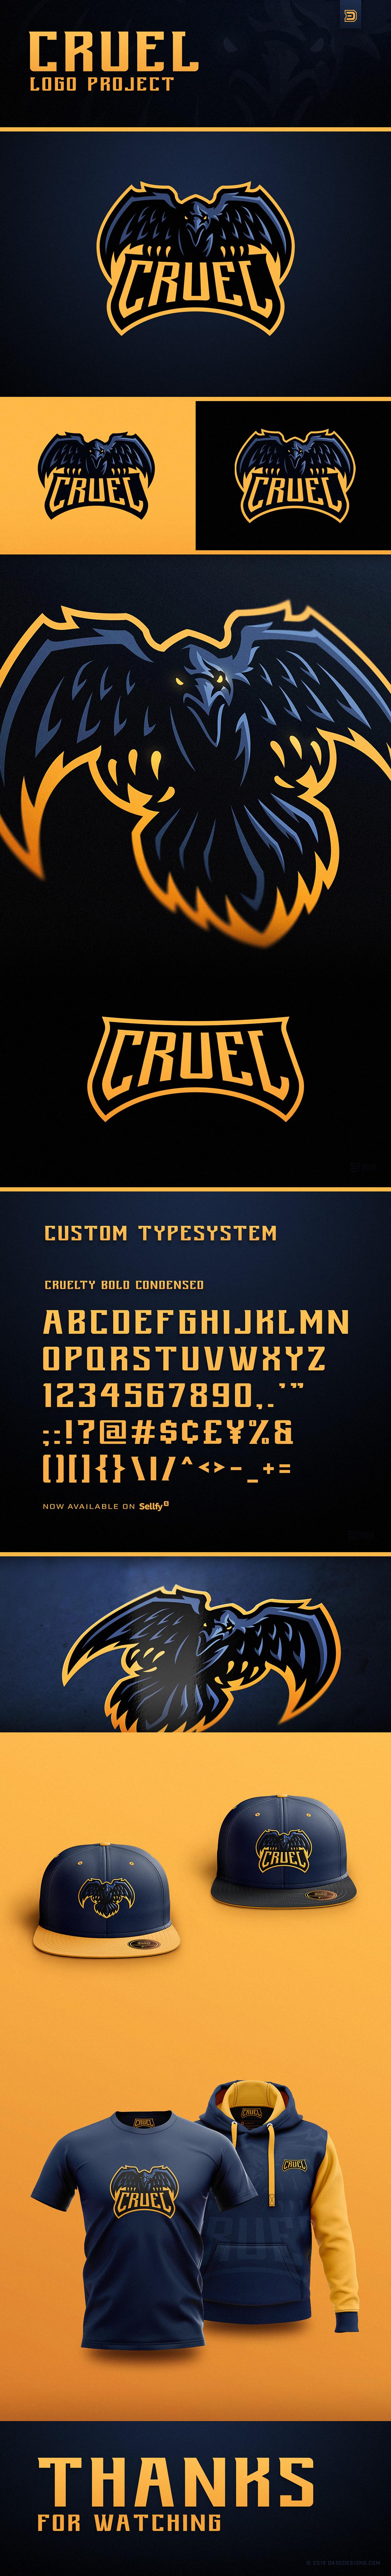 Cruel Gaming Logo Design - DaseDesigns